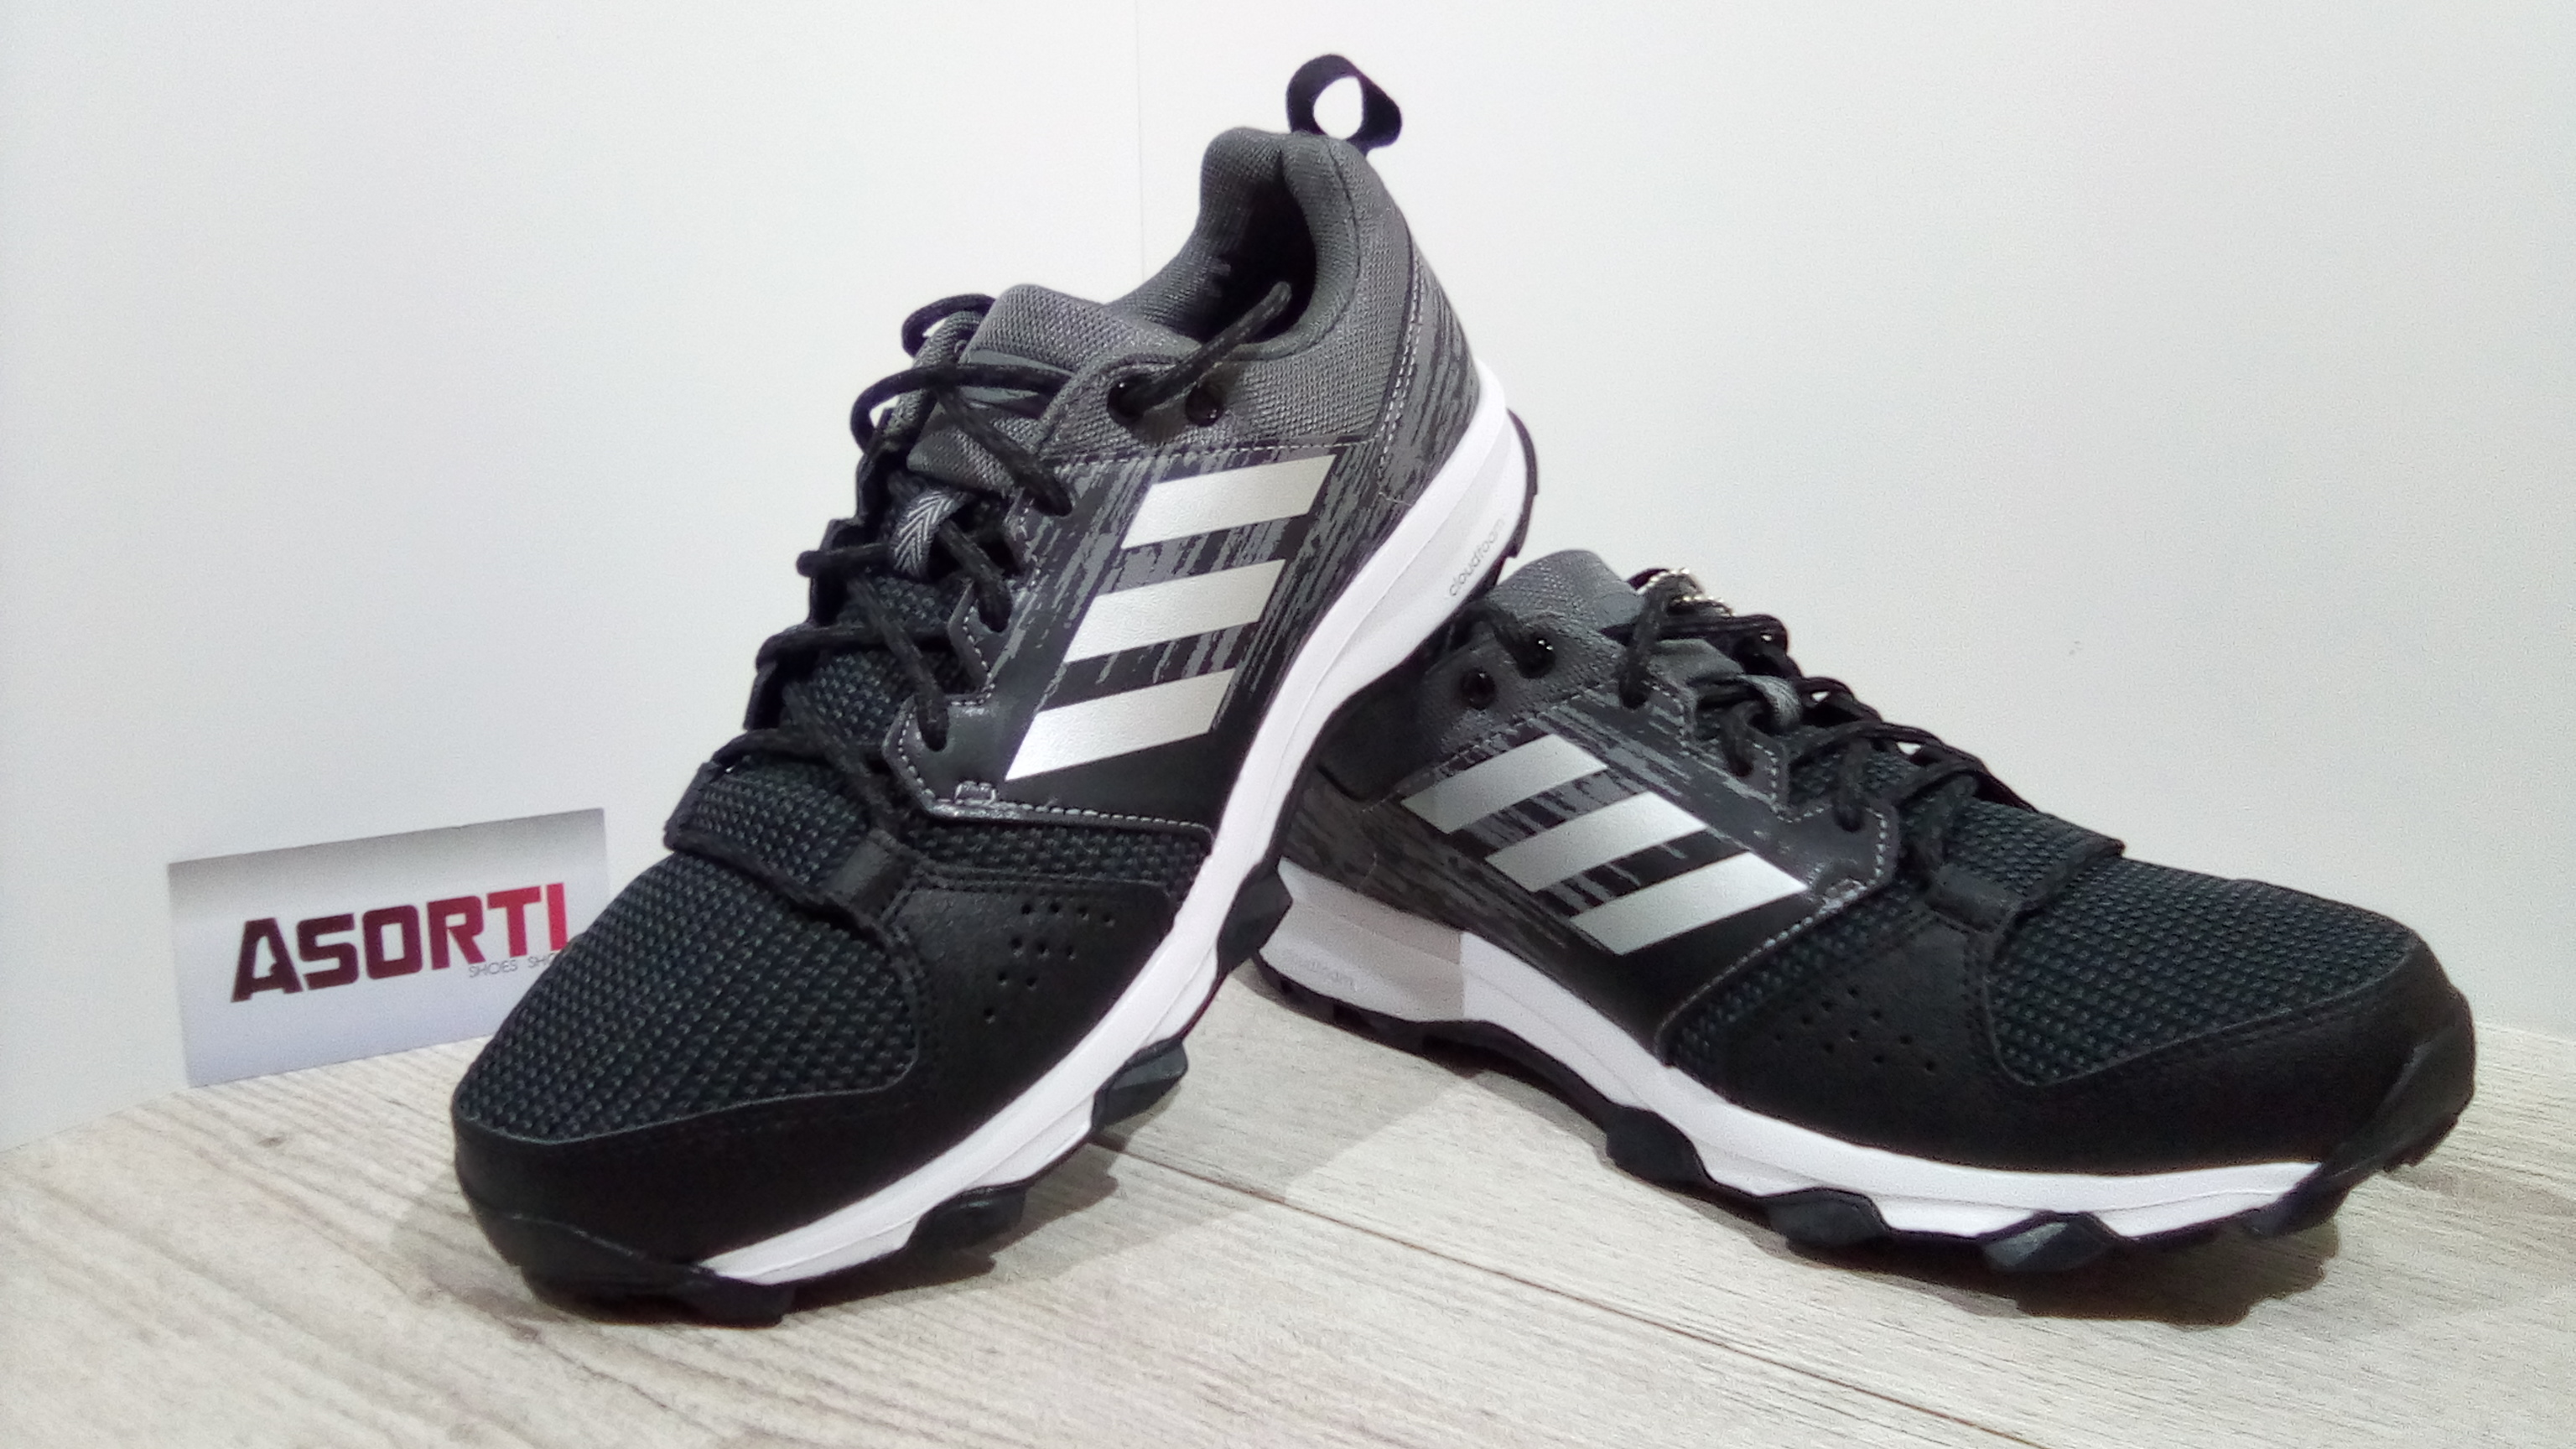 a165629c Чоловічі бігові кросівки Adidas Galaxy Trail M (CG3979) чорні/сірі ...